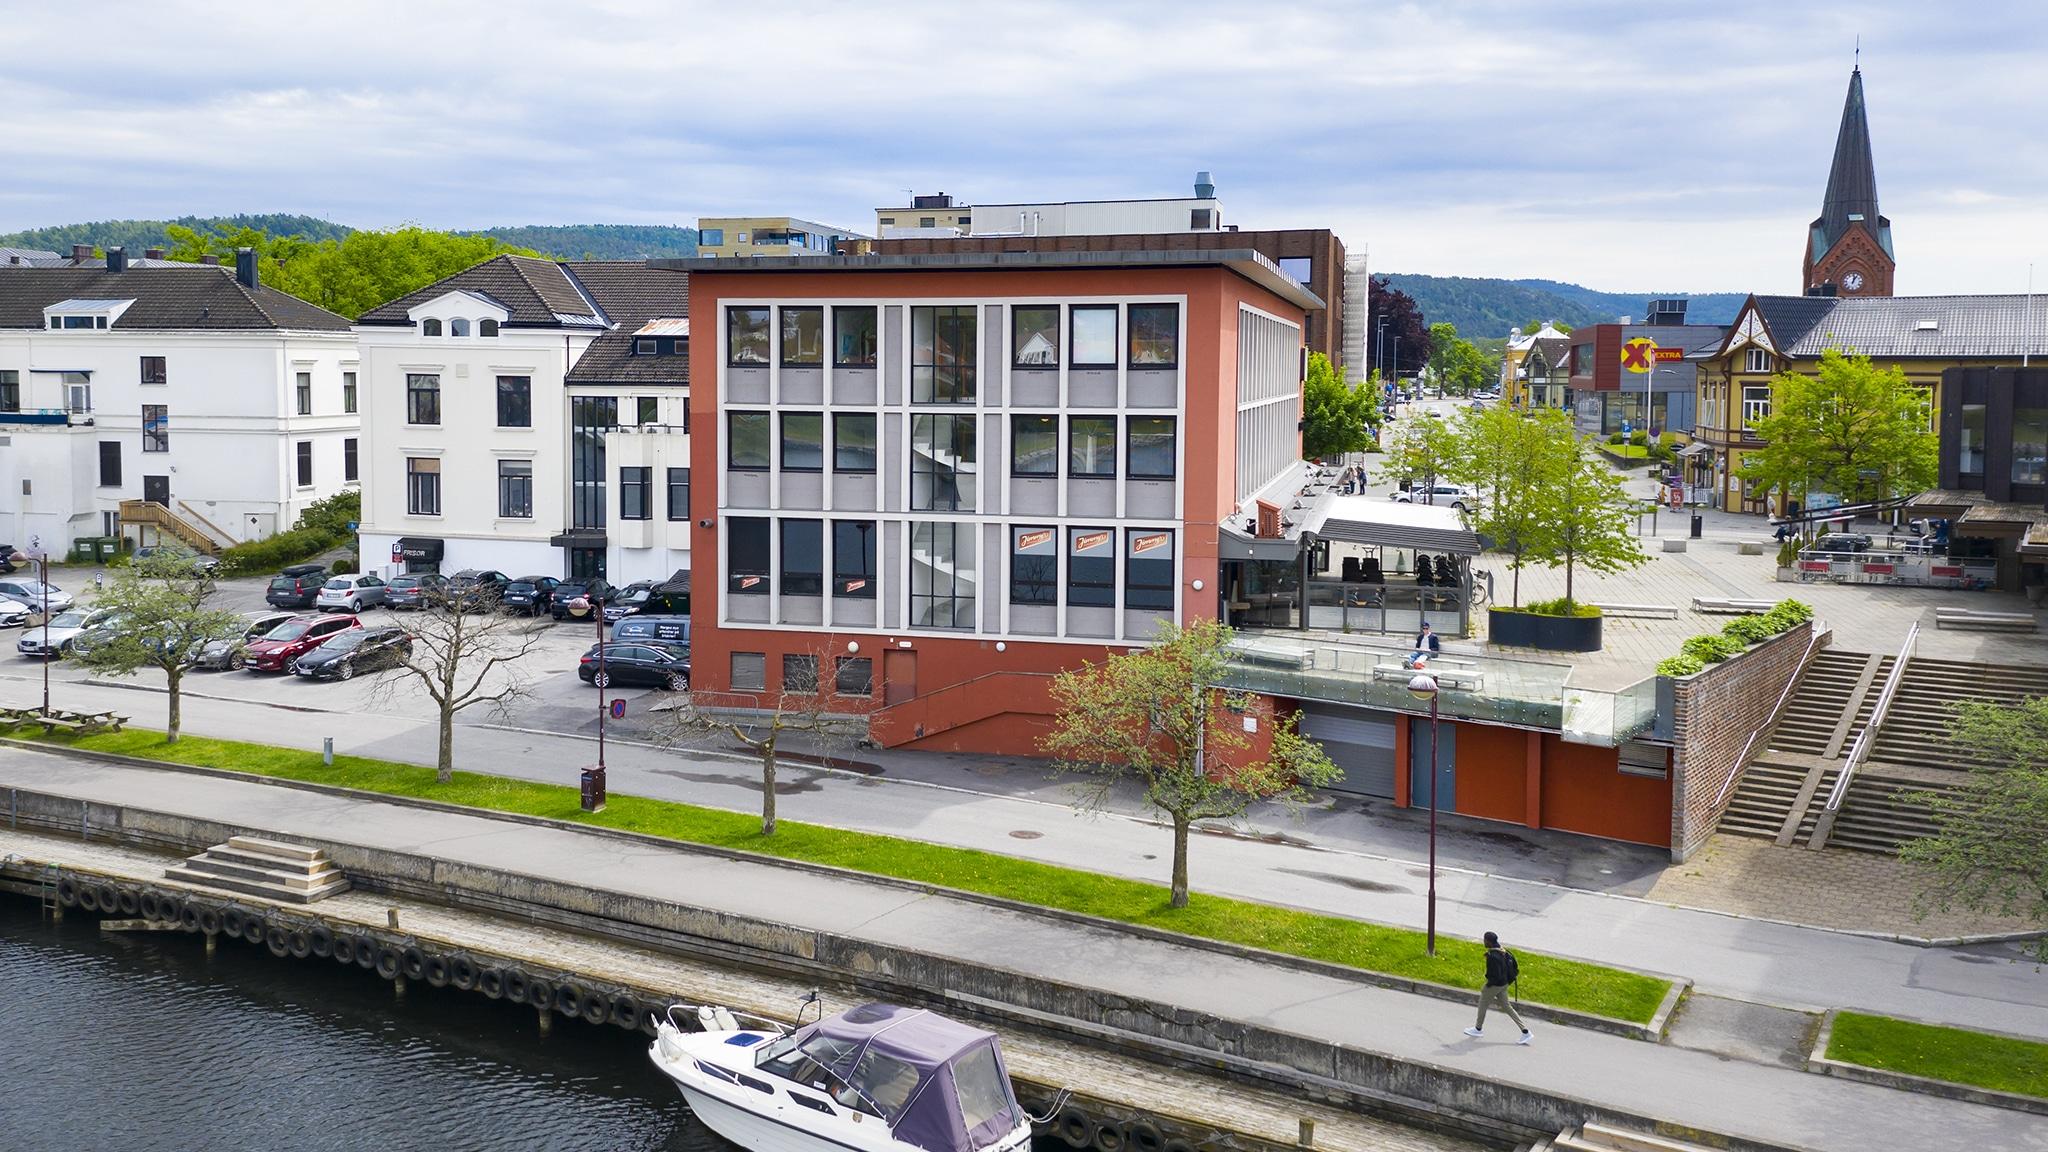 Helsetjeneste kontor sentrumgården storgata 146 Porsgrunn 6